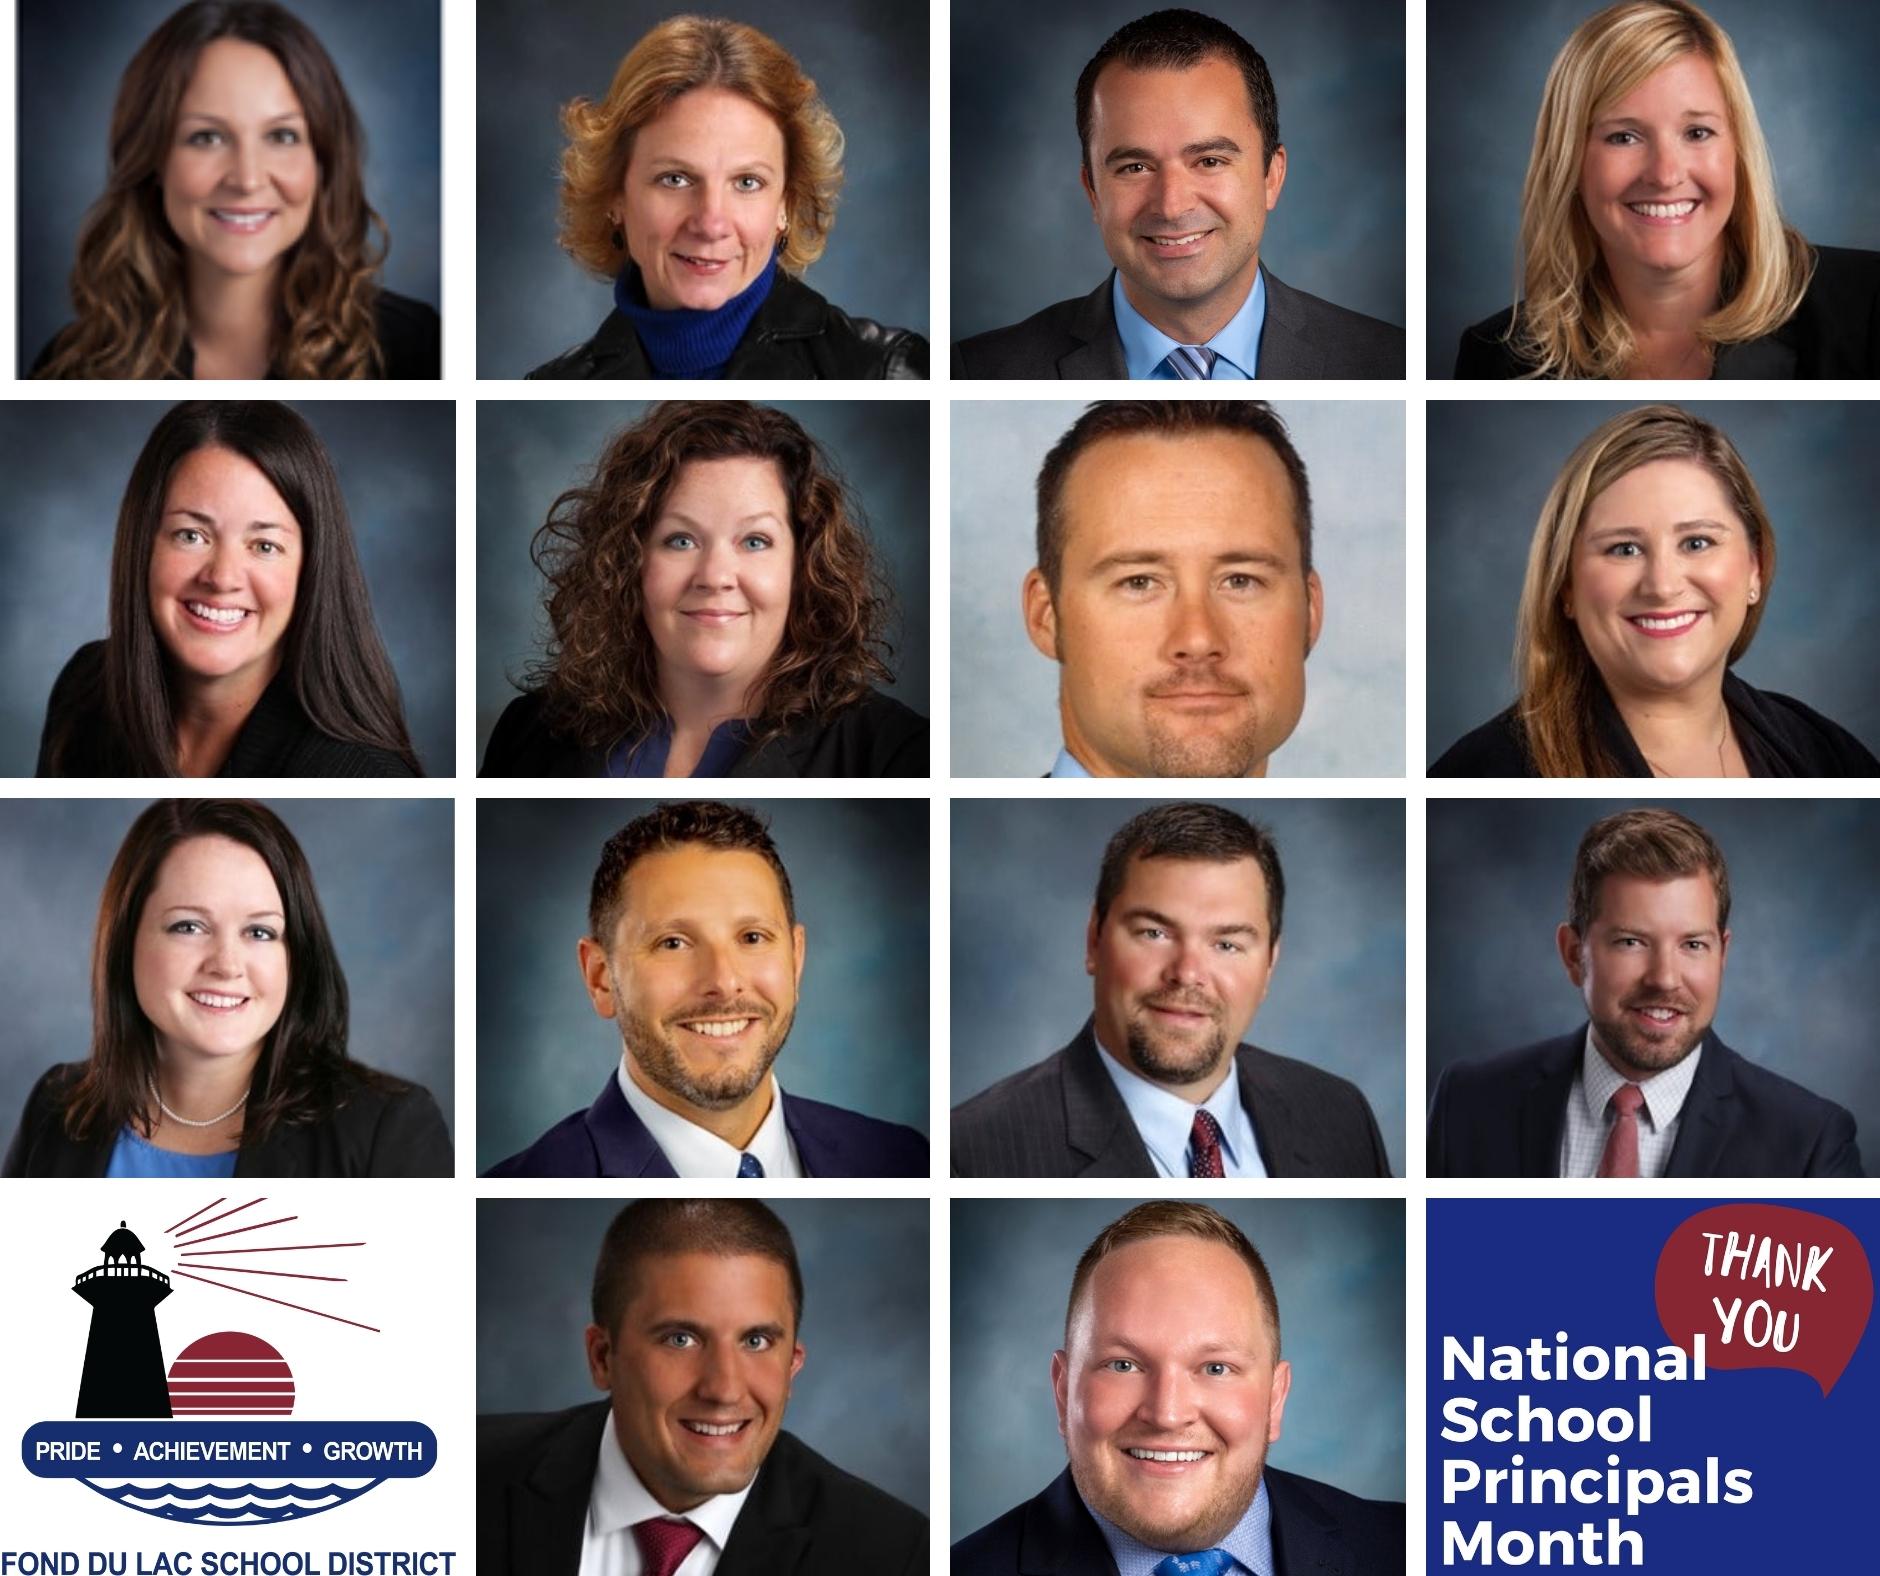 Collage of Principals' portraits